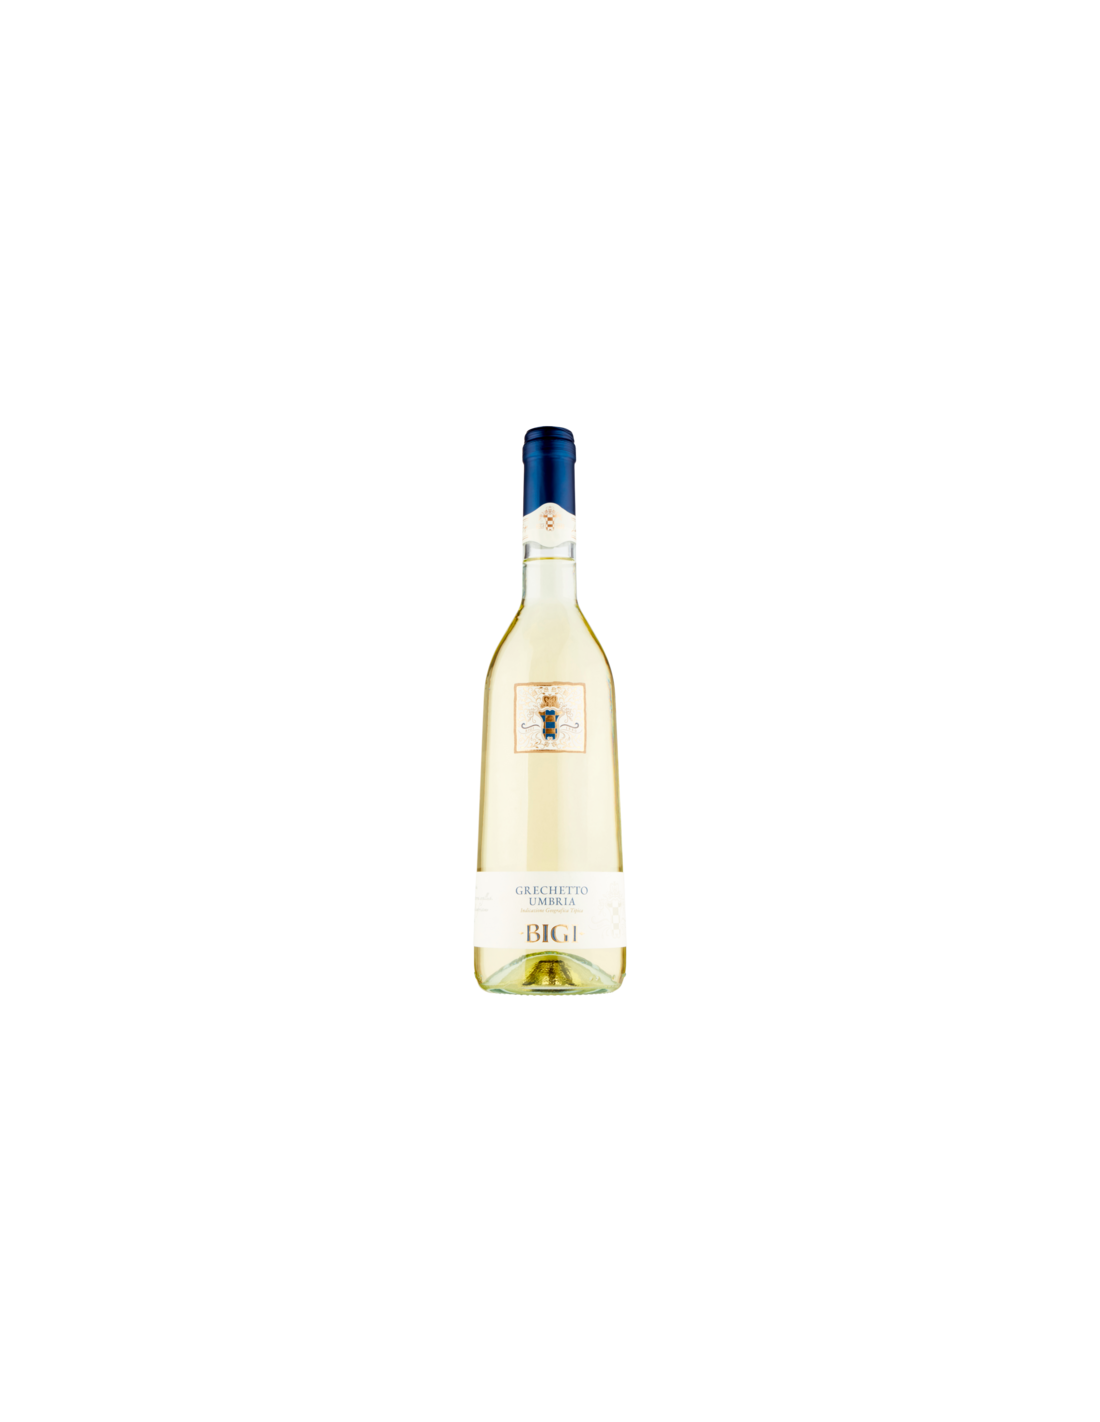 Vin alb sec, Grechetto, Bigi Umbria, 12% alc., 0.75L, Italia